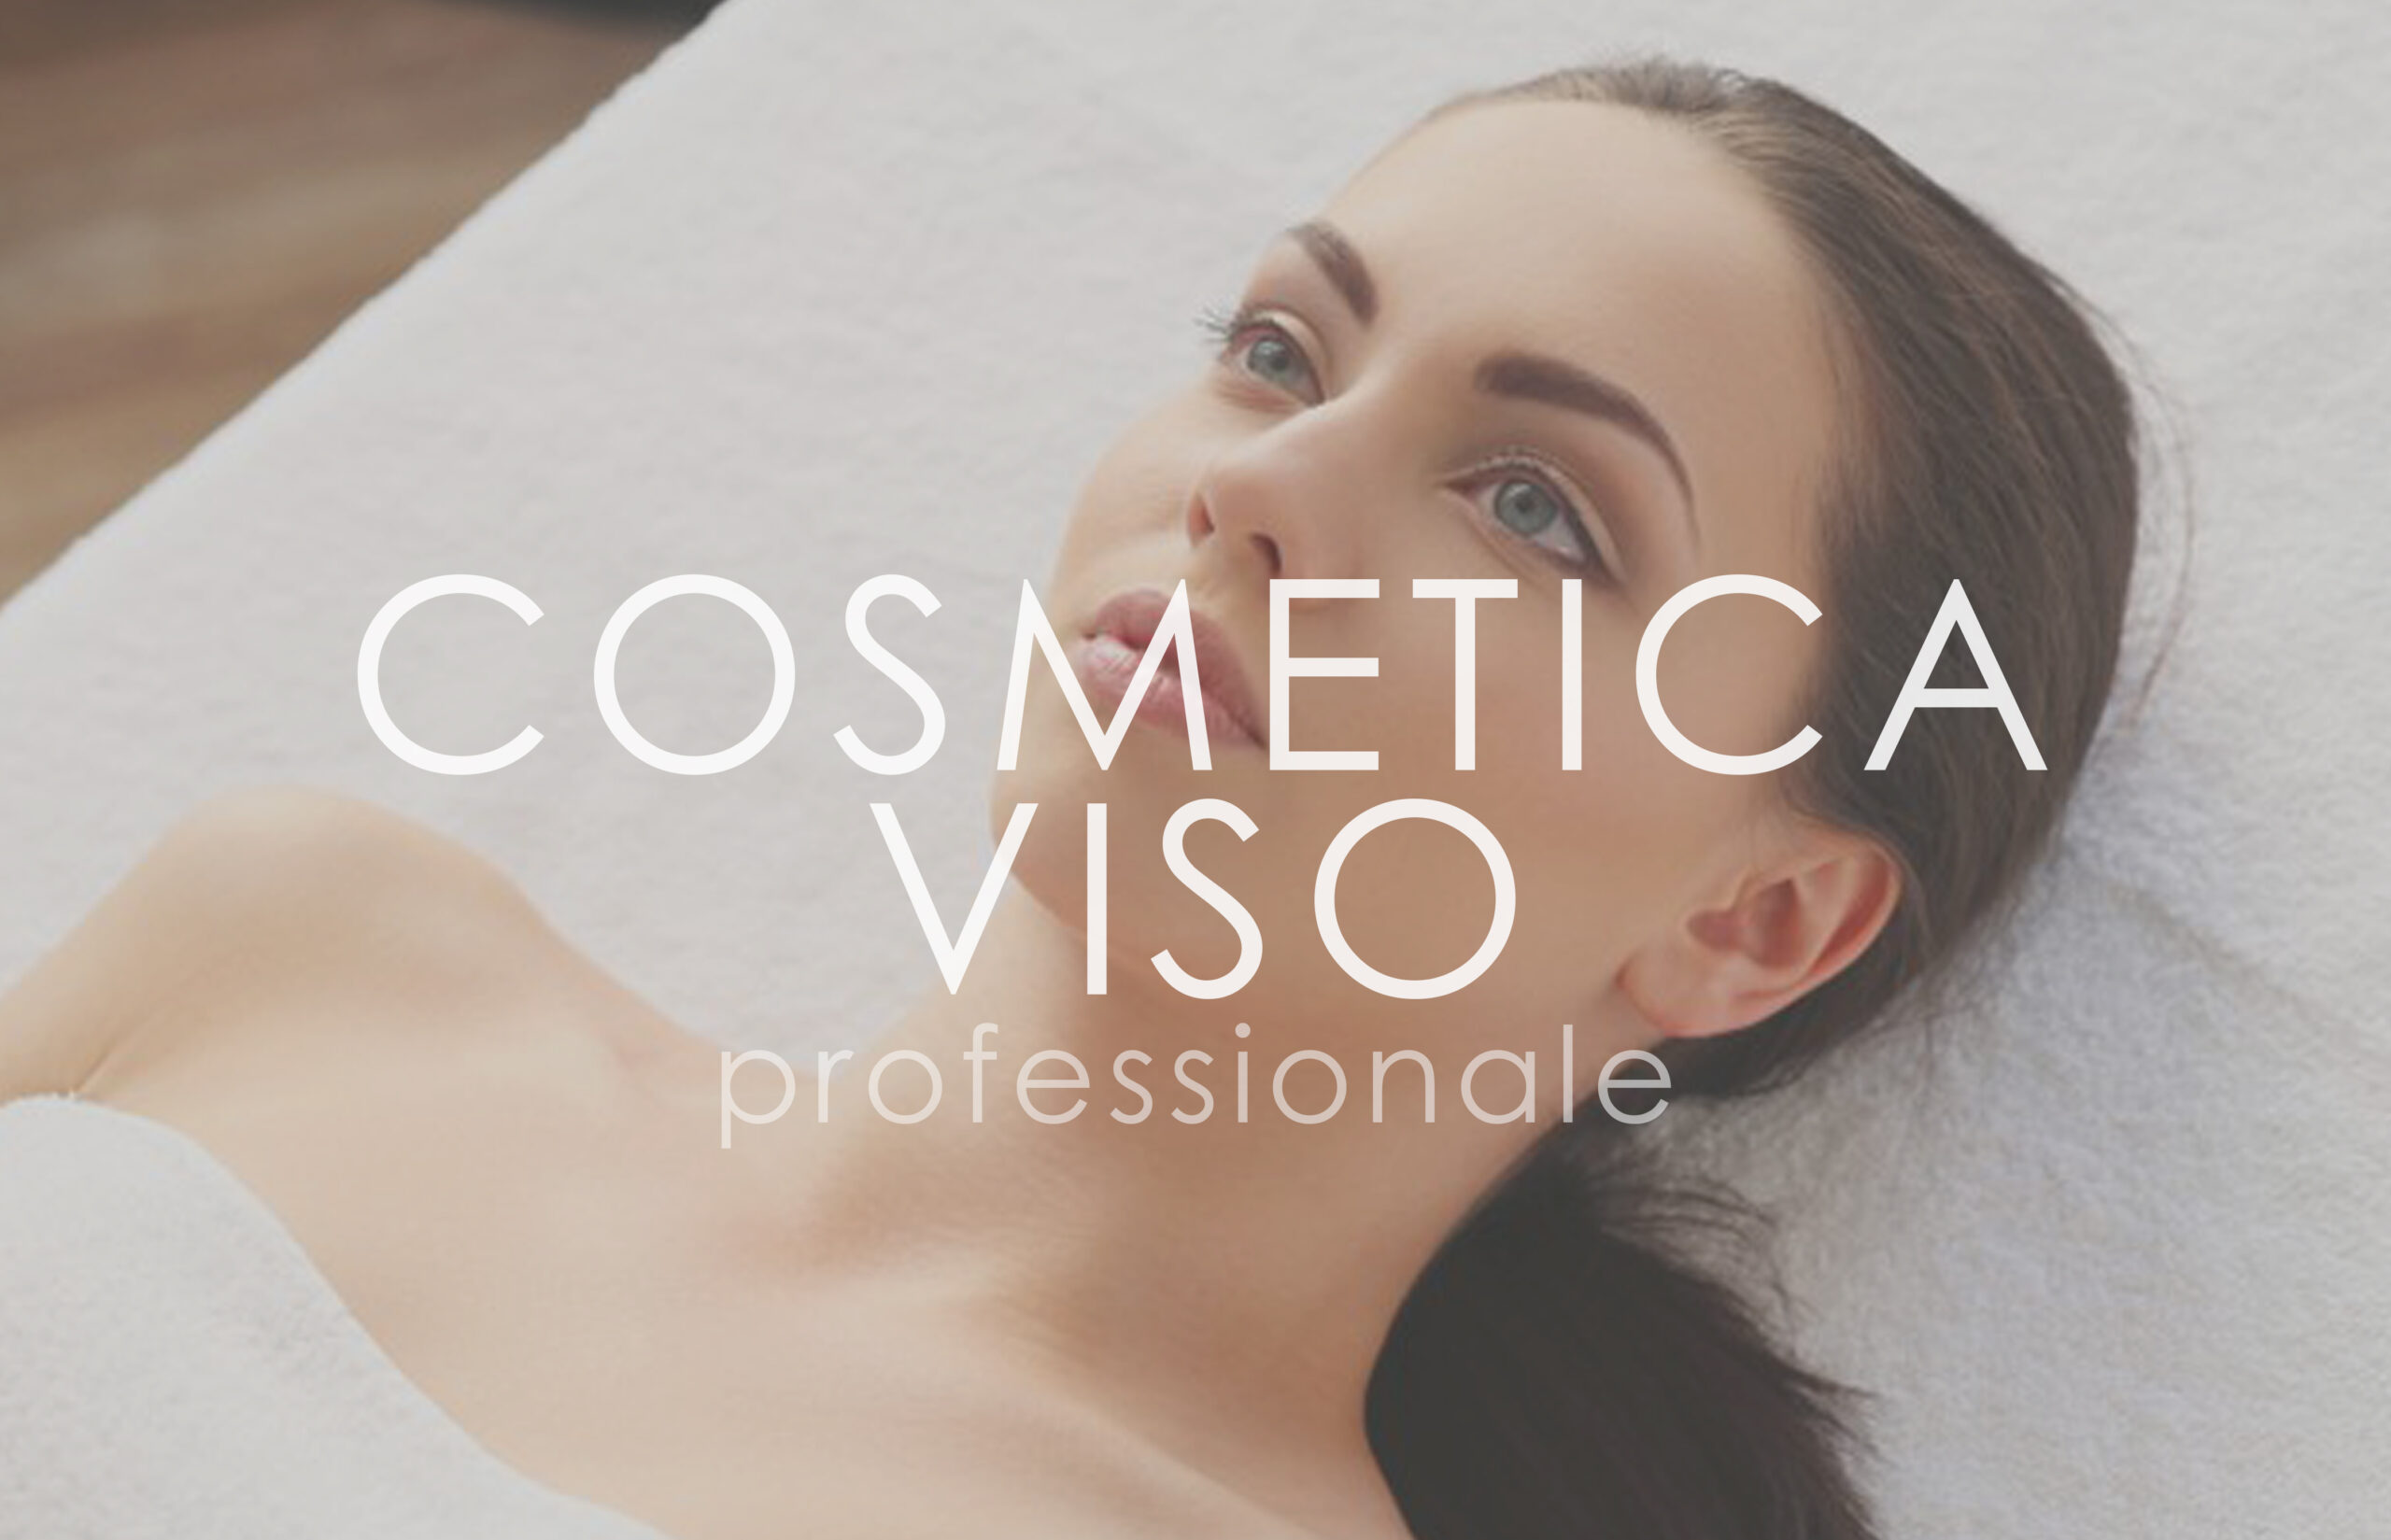 Cosmetica professionale viso EXA